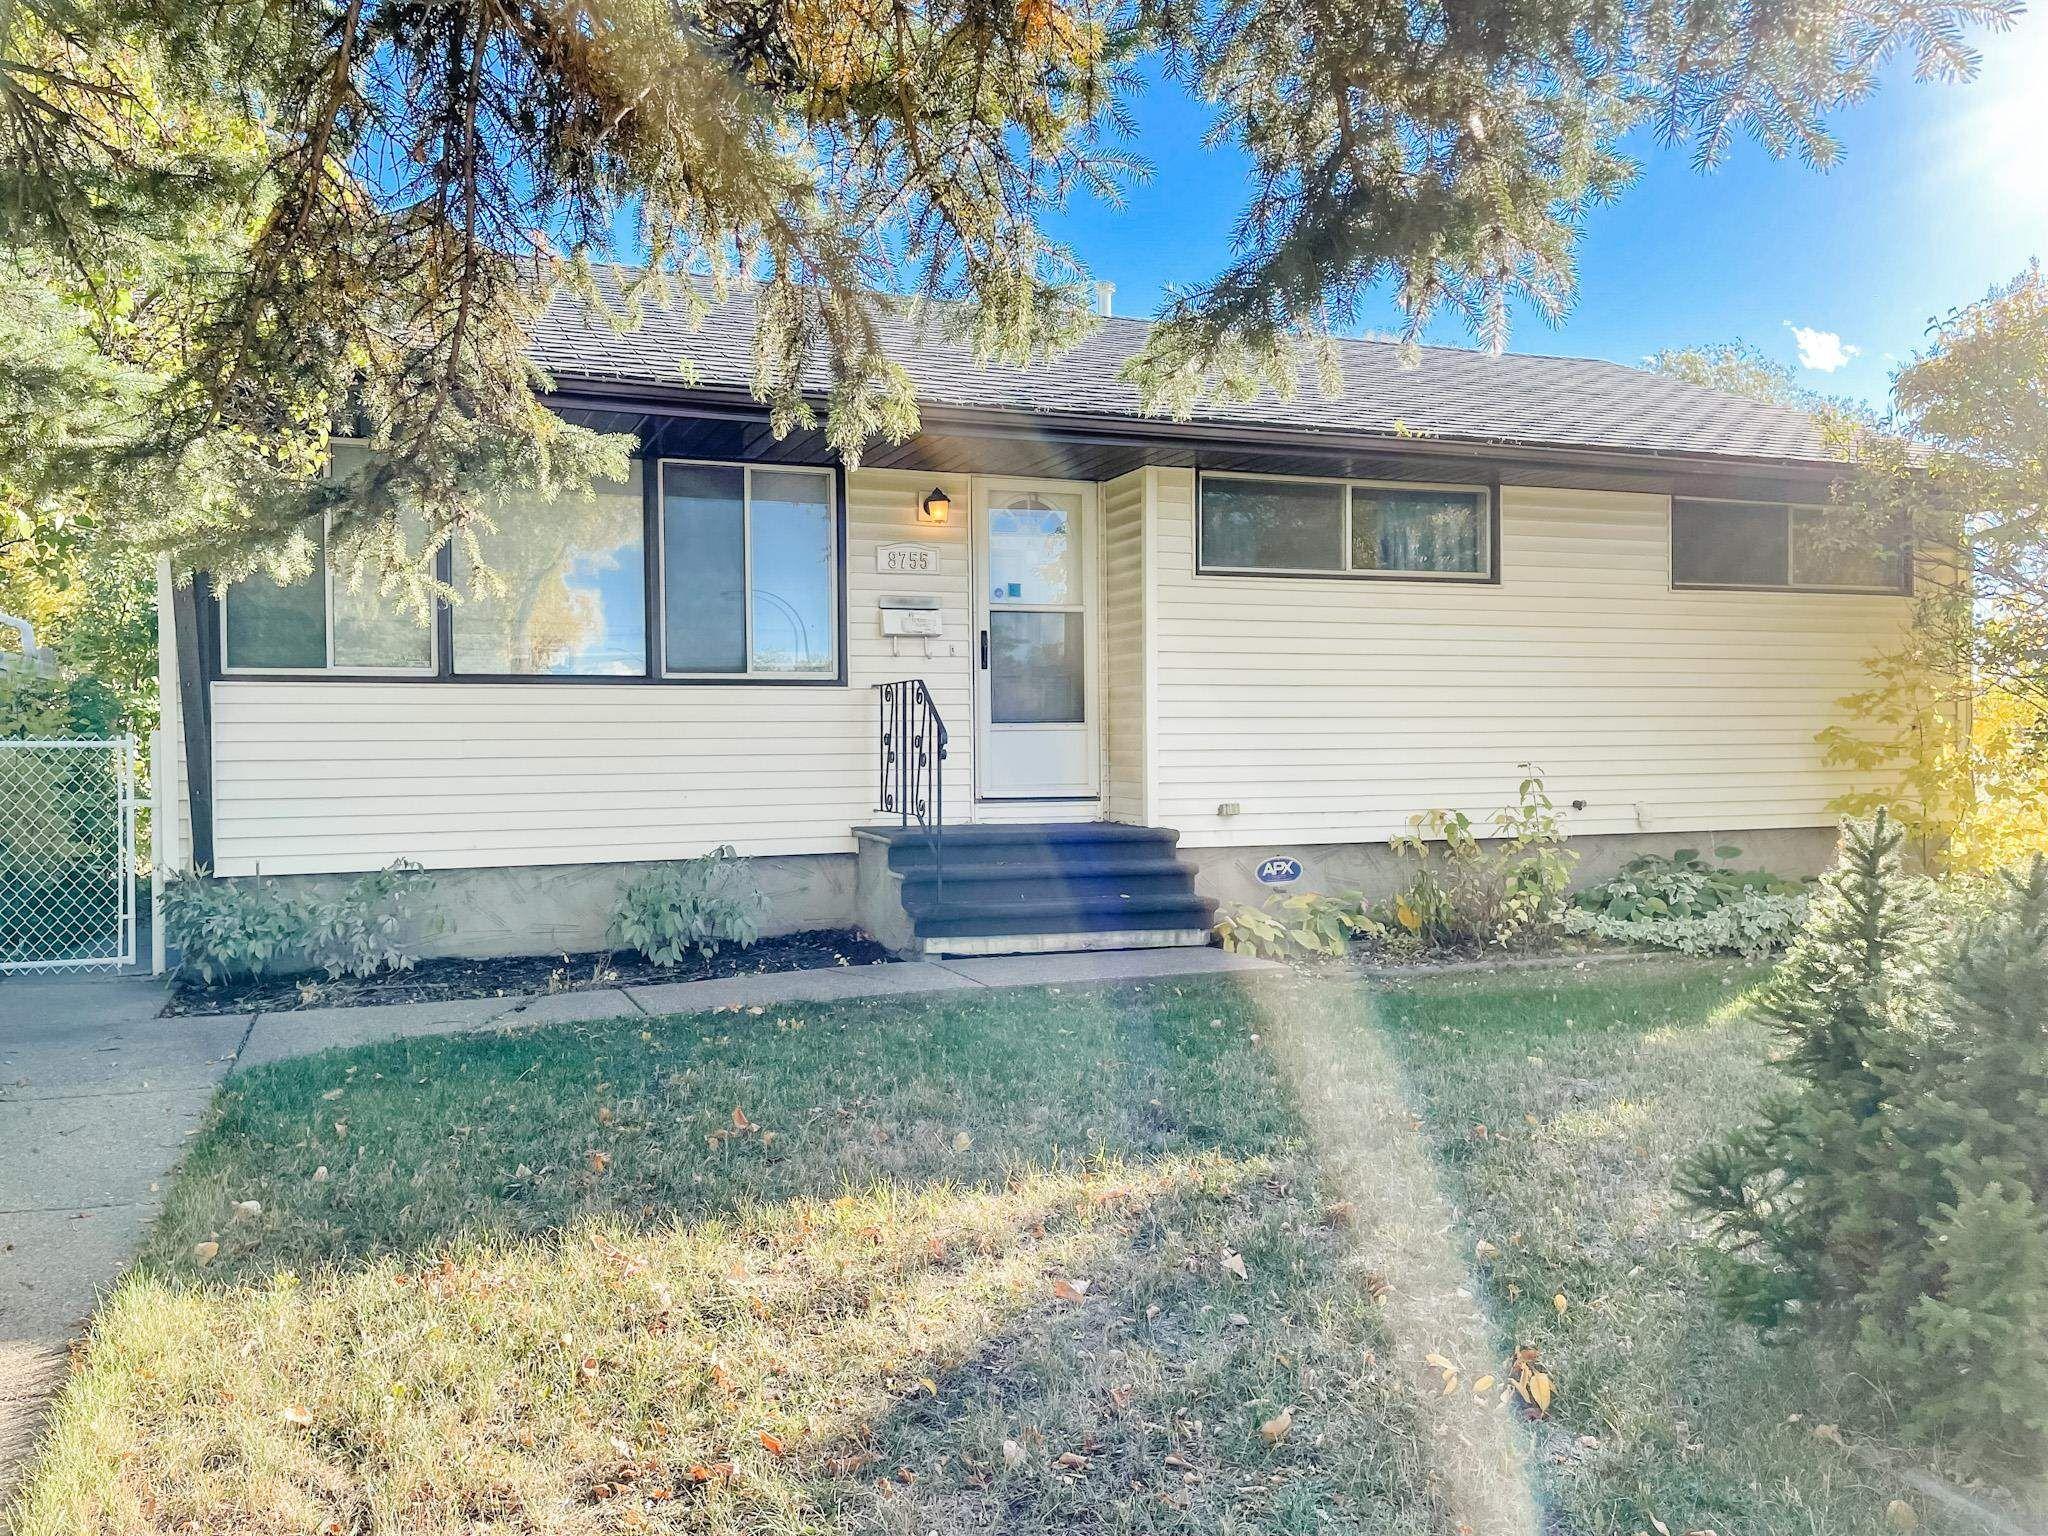 Main Photo: 8755 64 Avenue in Edmonton: Zone 17 House for sale : MLS®# E4263854